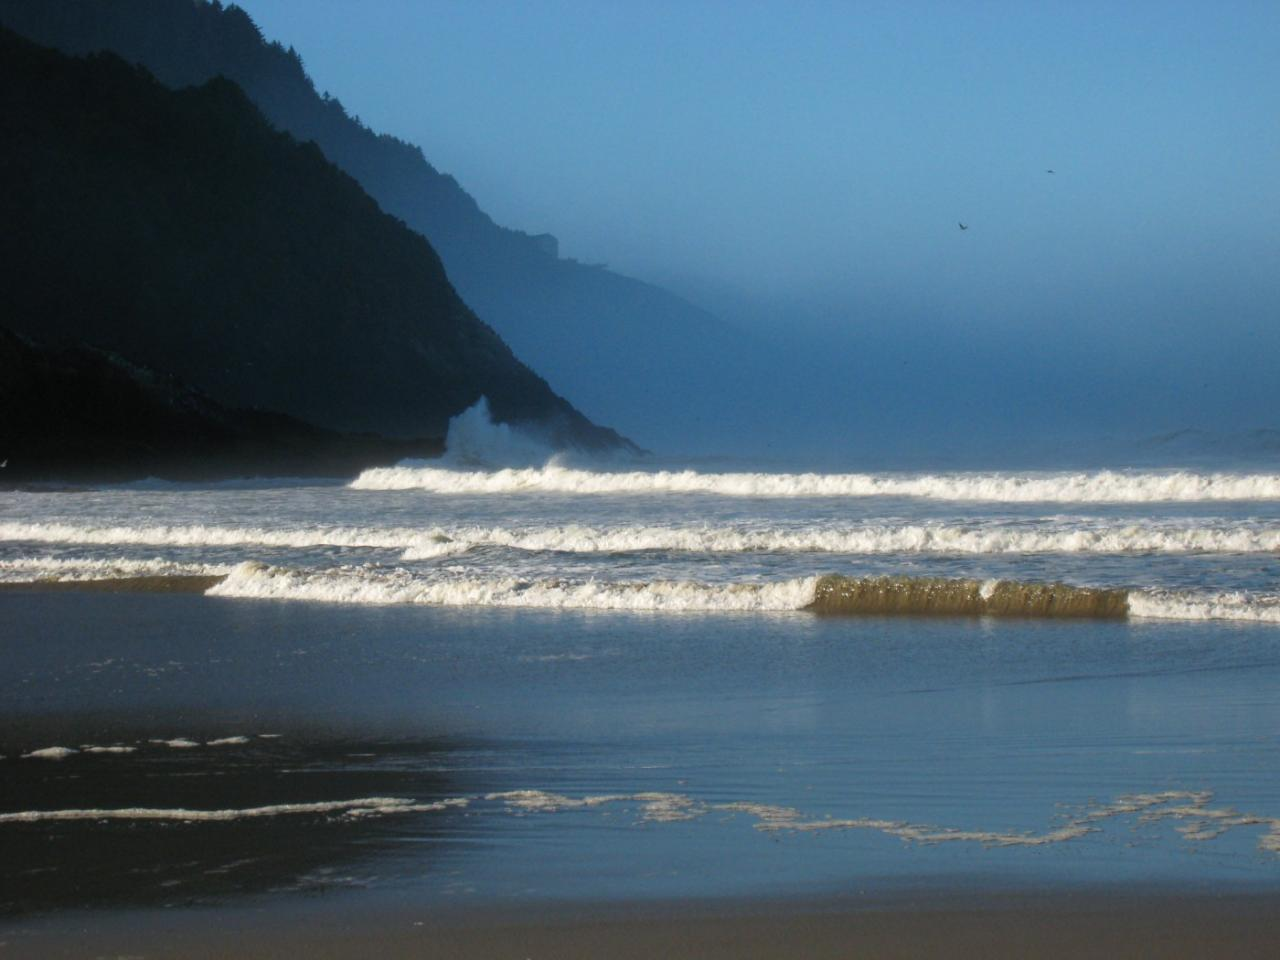 fog bank off shore on a sunny calm day